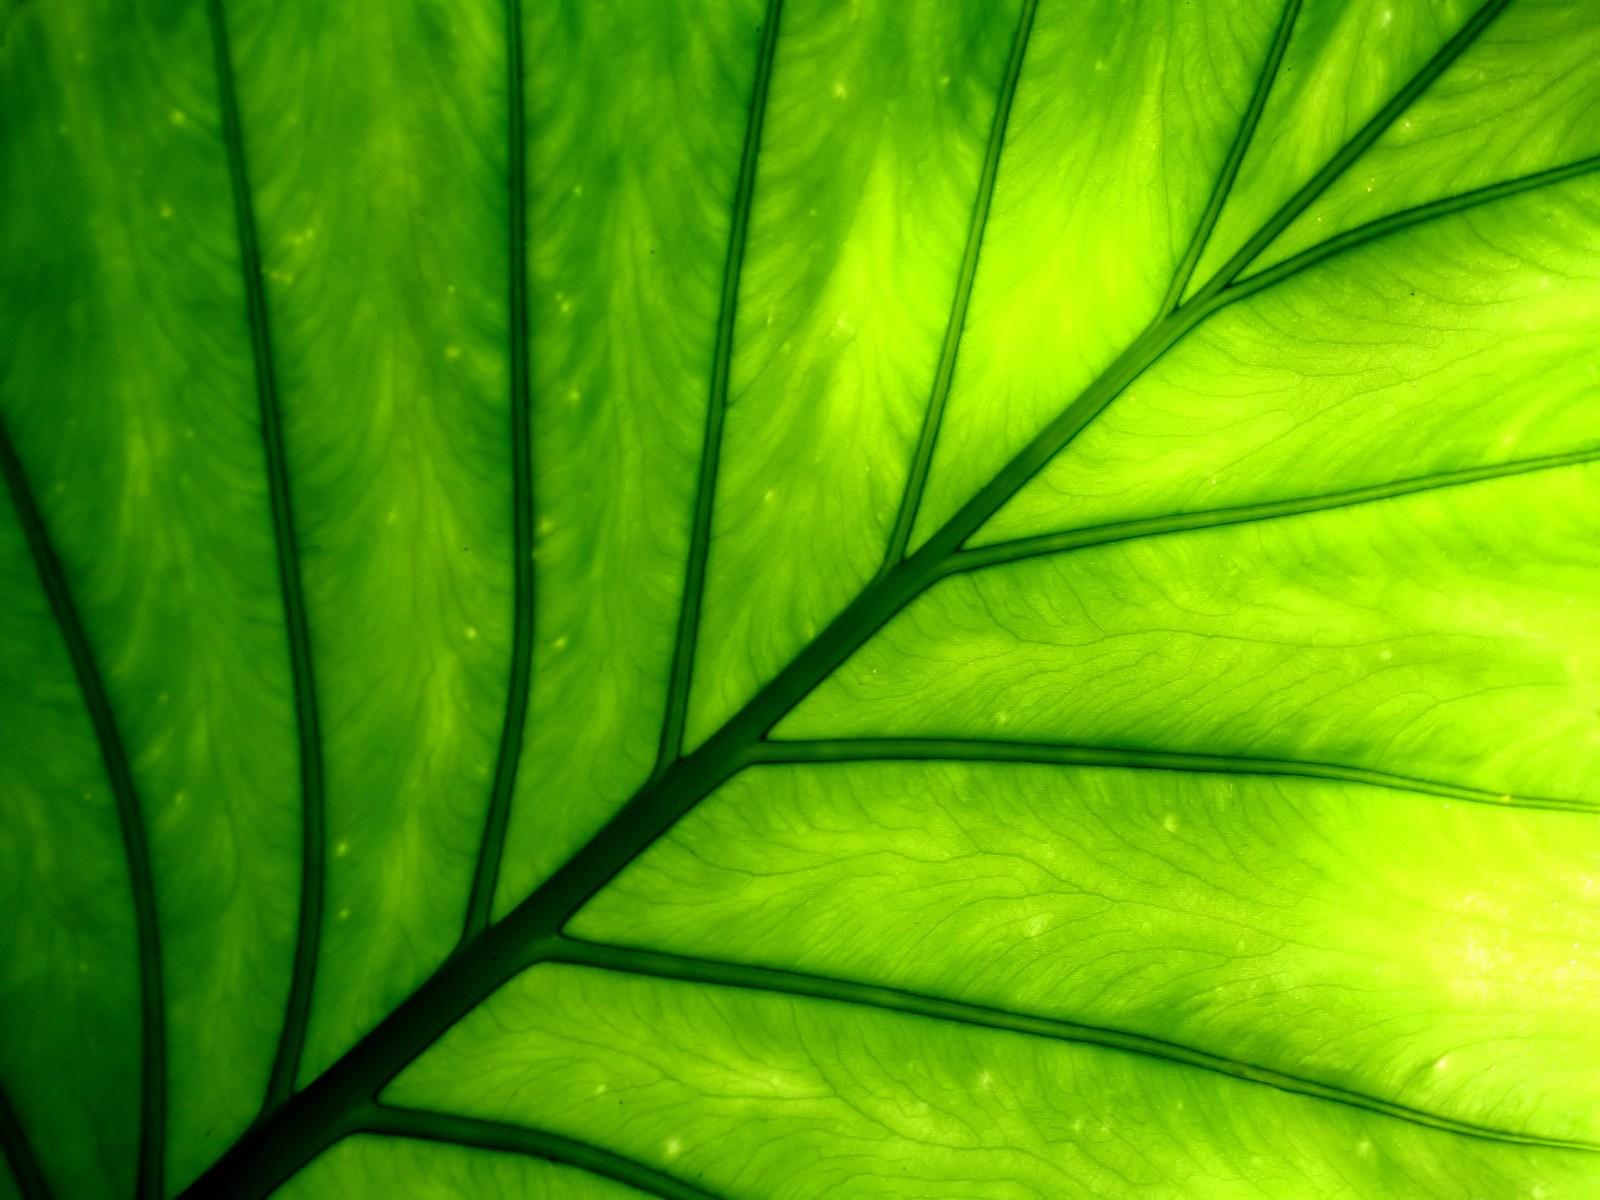 Amazing Plant Wallpaper 41758